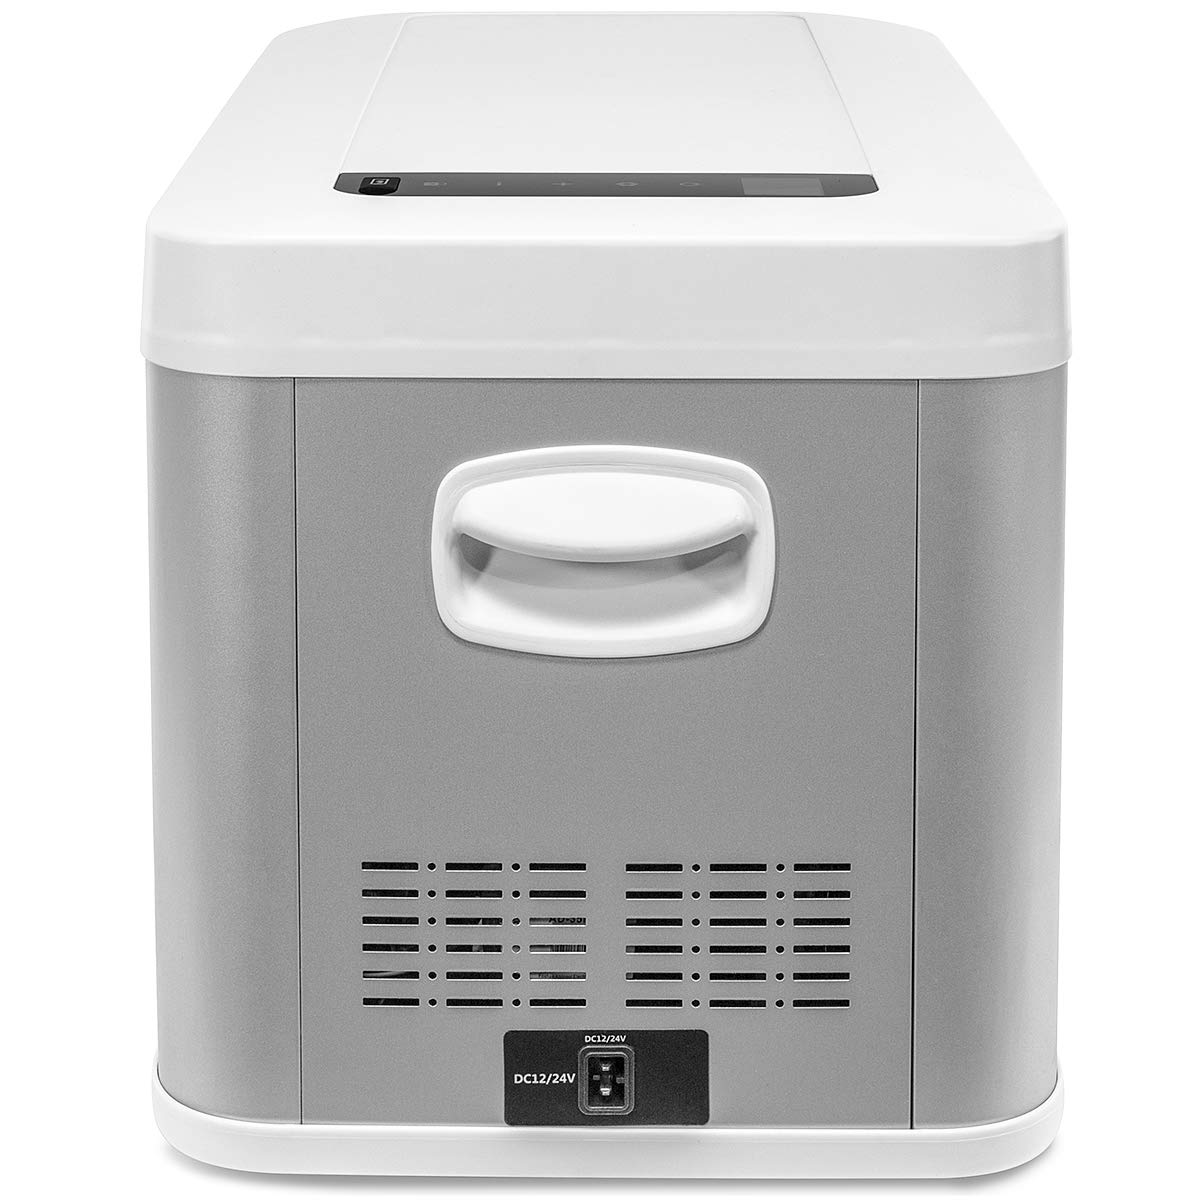 XtremepowerUS Portable Electric Cooler 26 Quart (Bluetooth Function) Refrigerator Adjustable Temperature Display Vehicle Car Mini Fridge ECO by XtremepowerUS (Image #3)